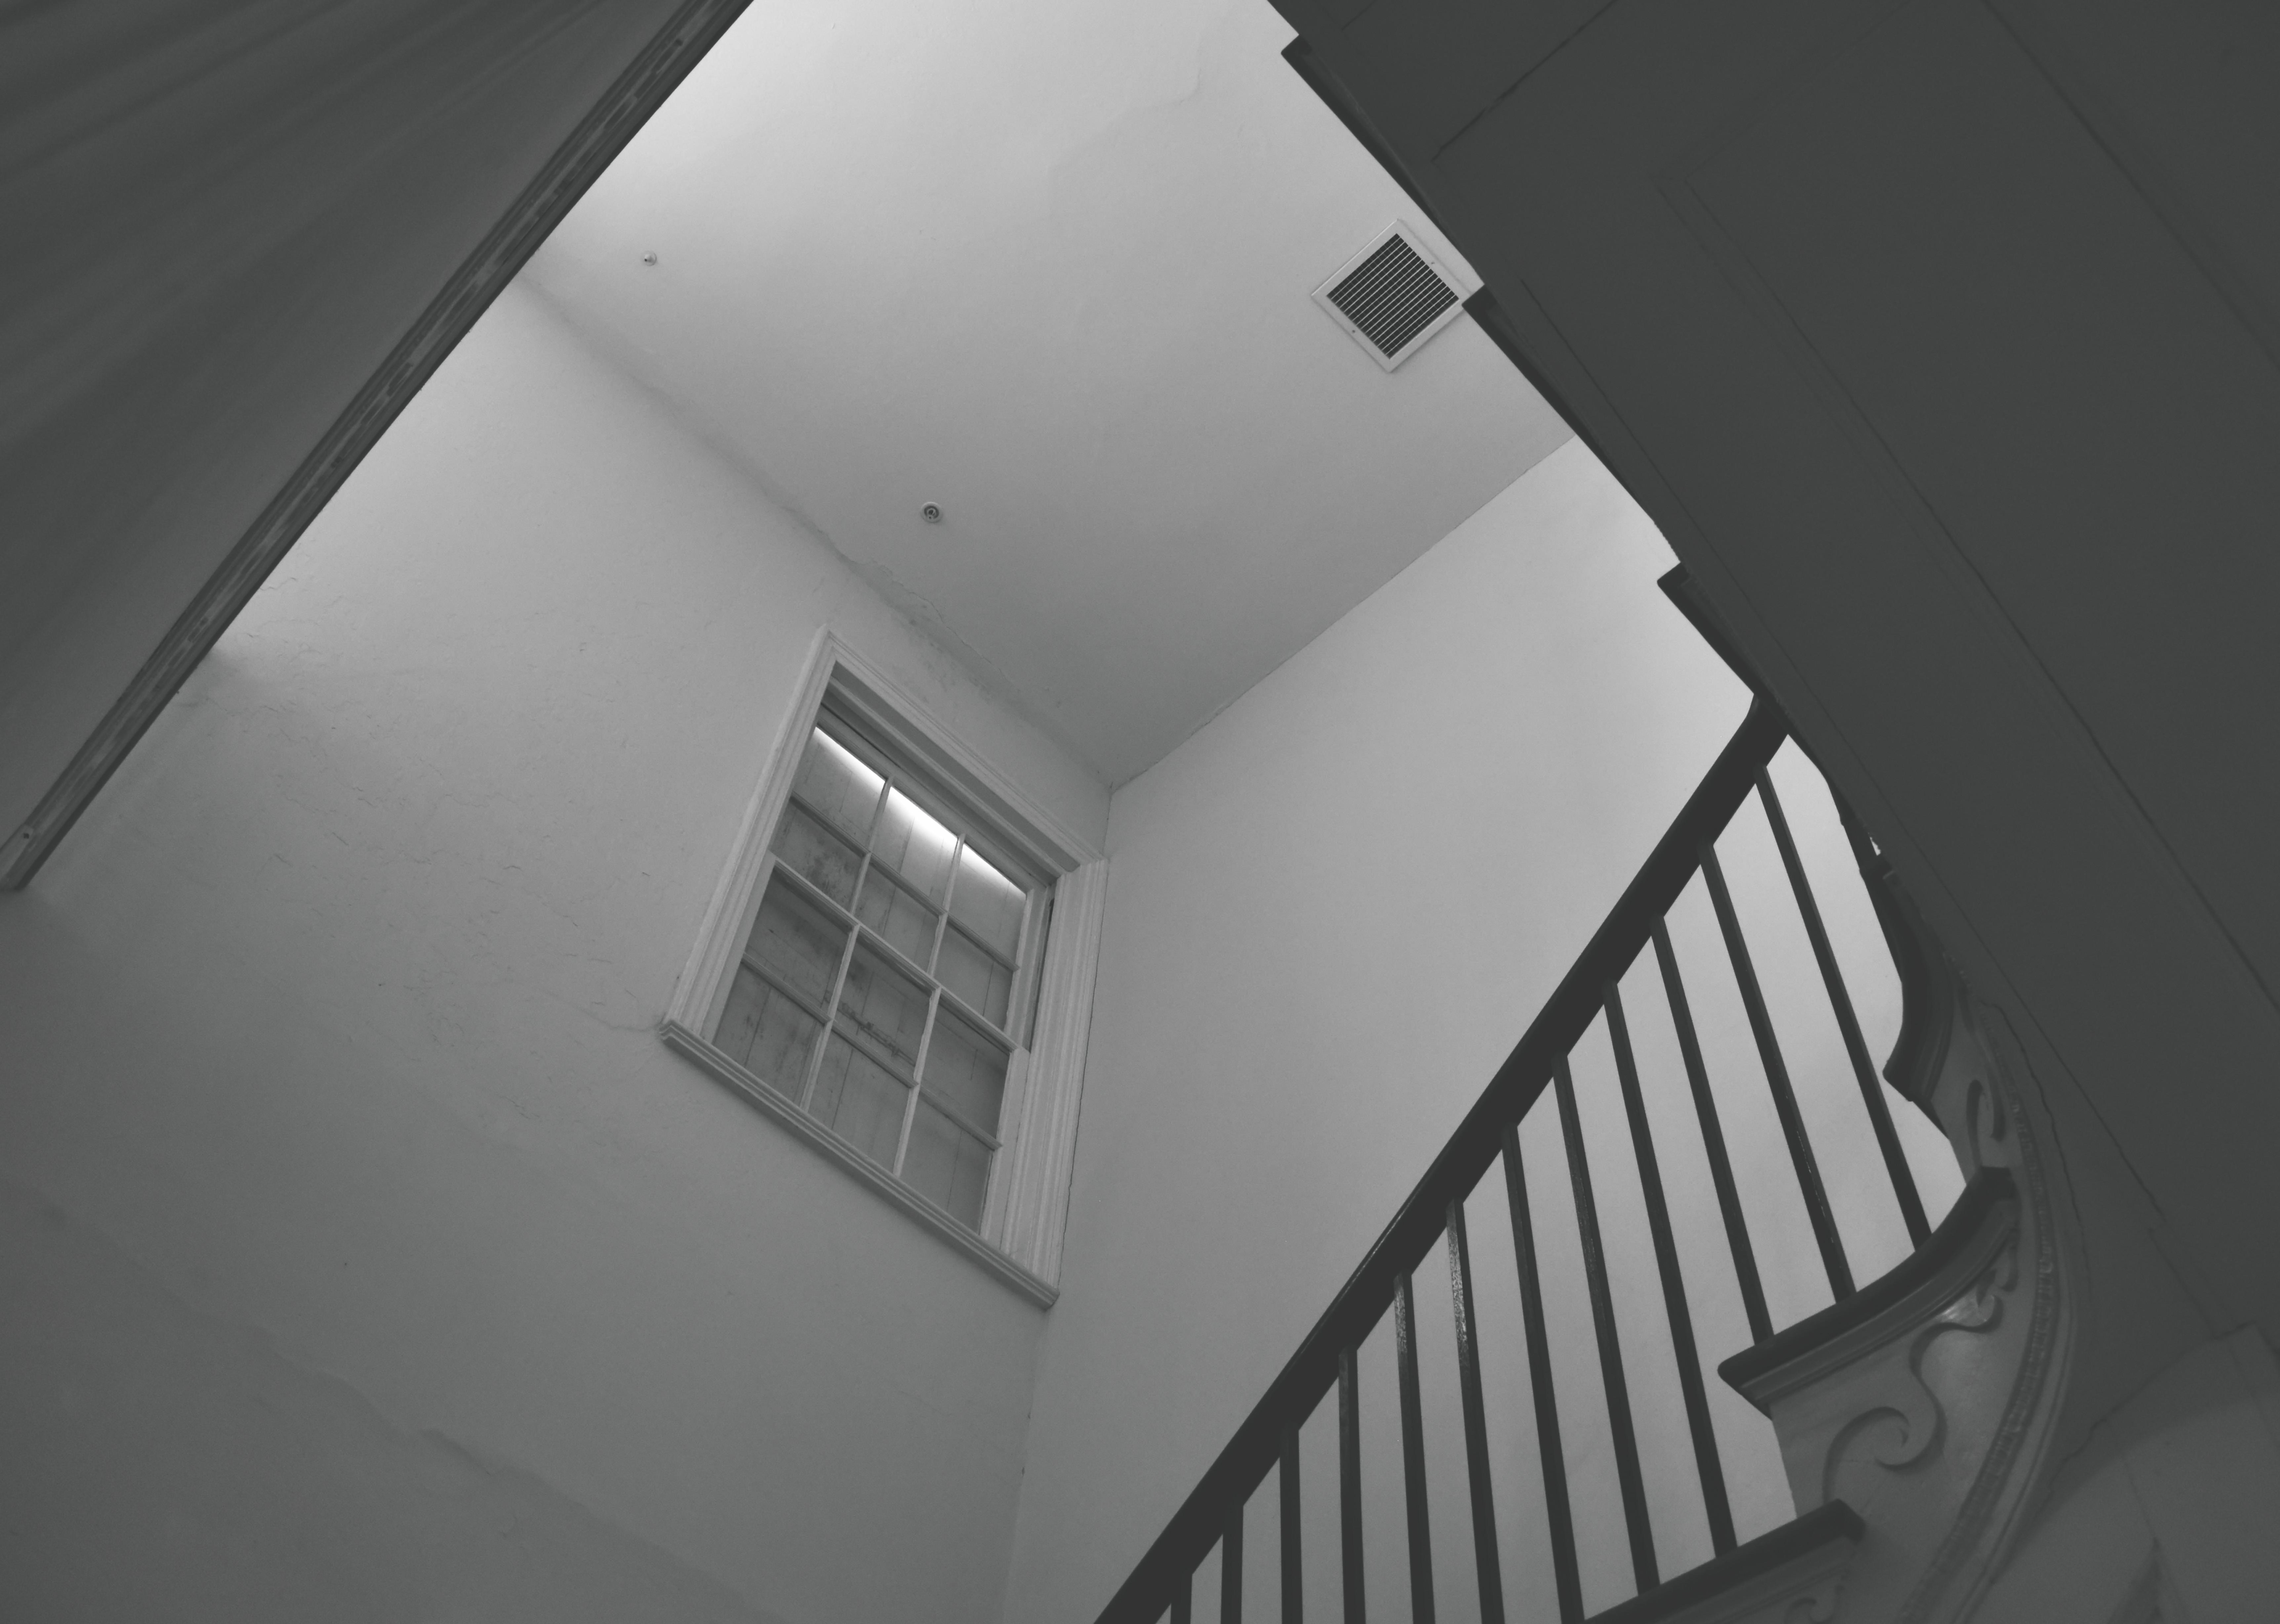 Gratis stockfoto van trap trappenhuis